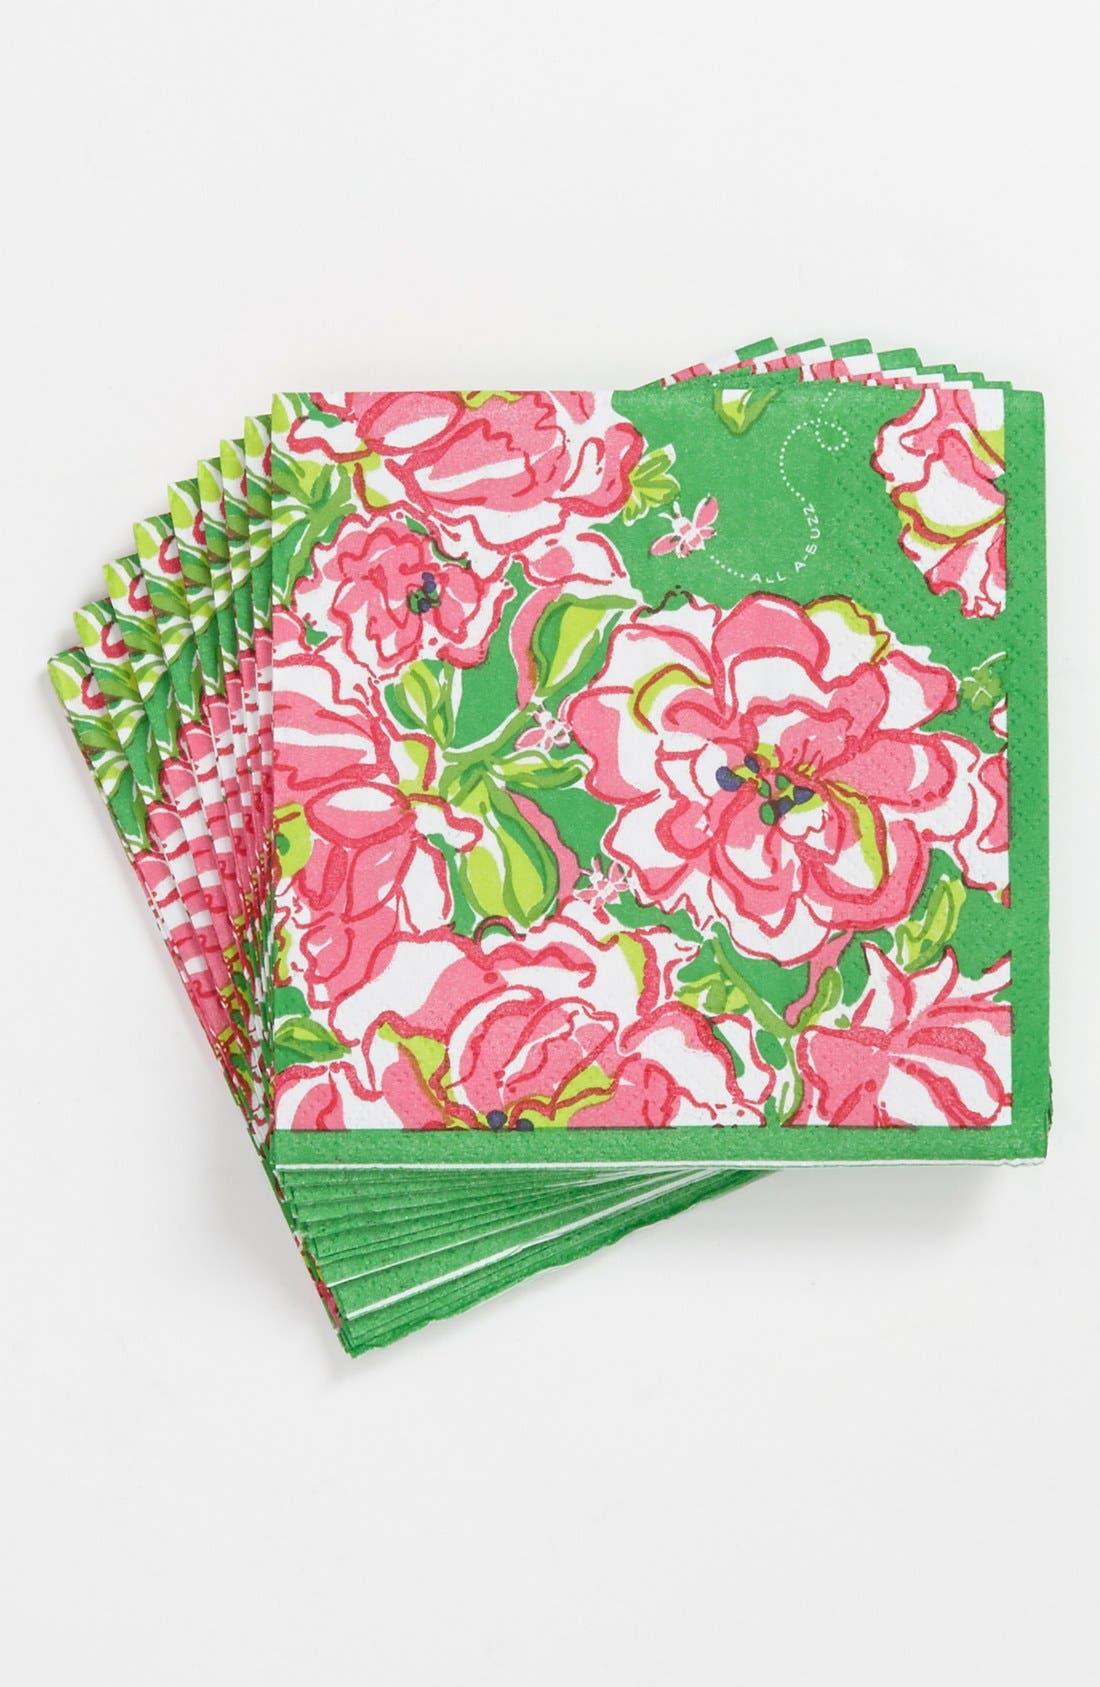 Main Image - Lilly Pulitzer® Floral Print Beverage Napkins (Set of 20)